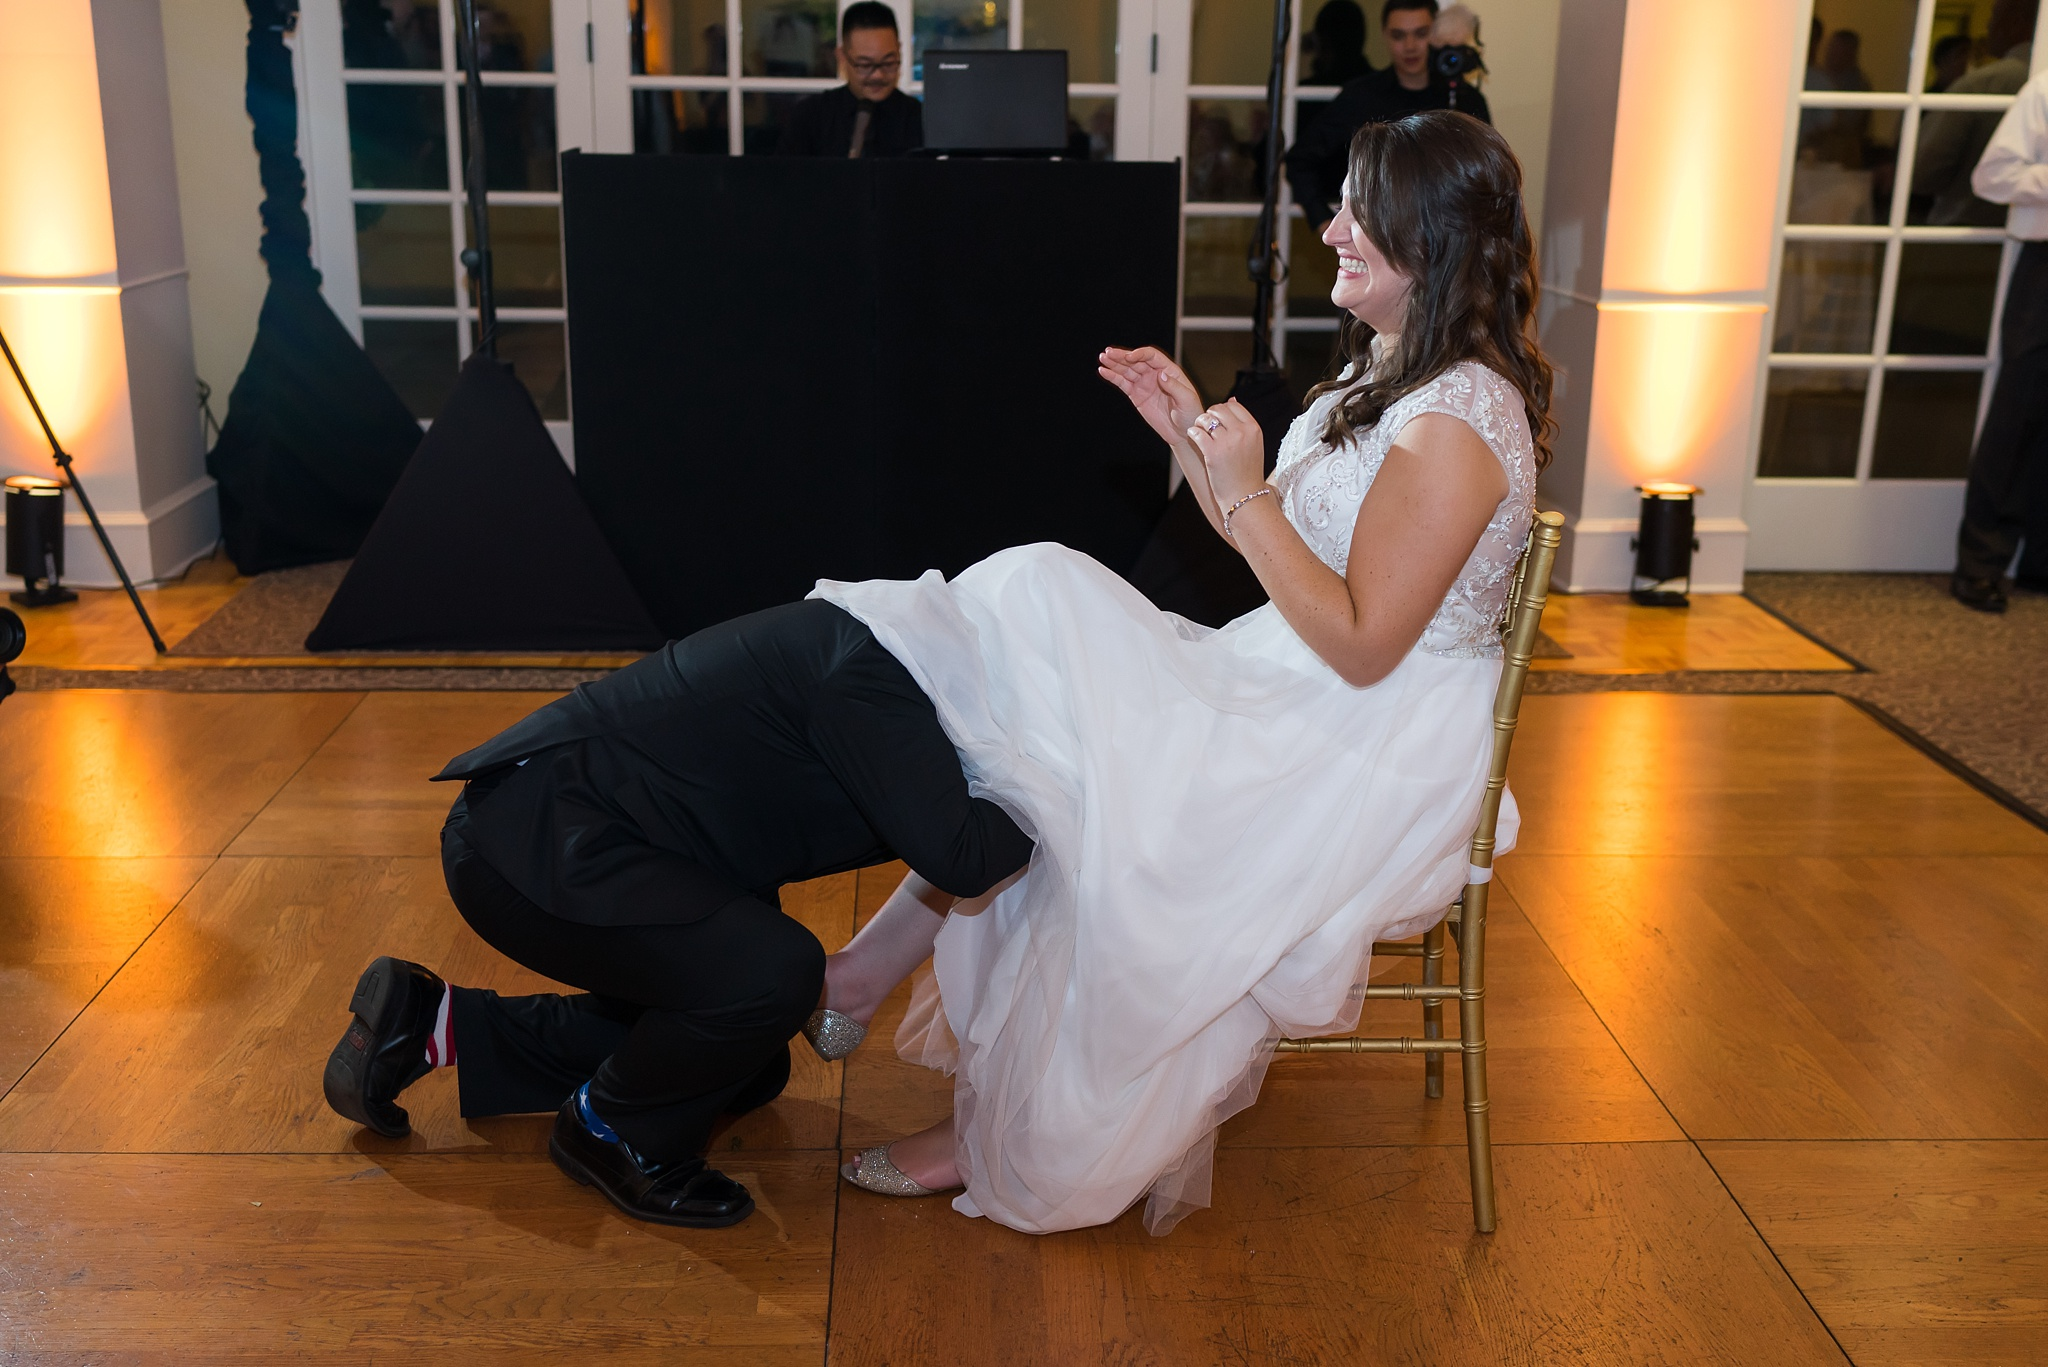 TommyandAmanda_WEDDING_BrienneMichelle_Reception_121_BLOG.jpg